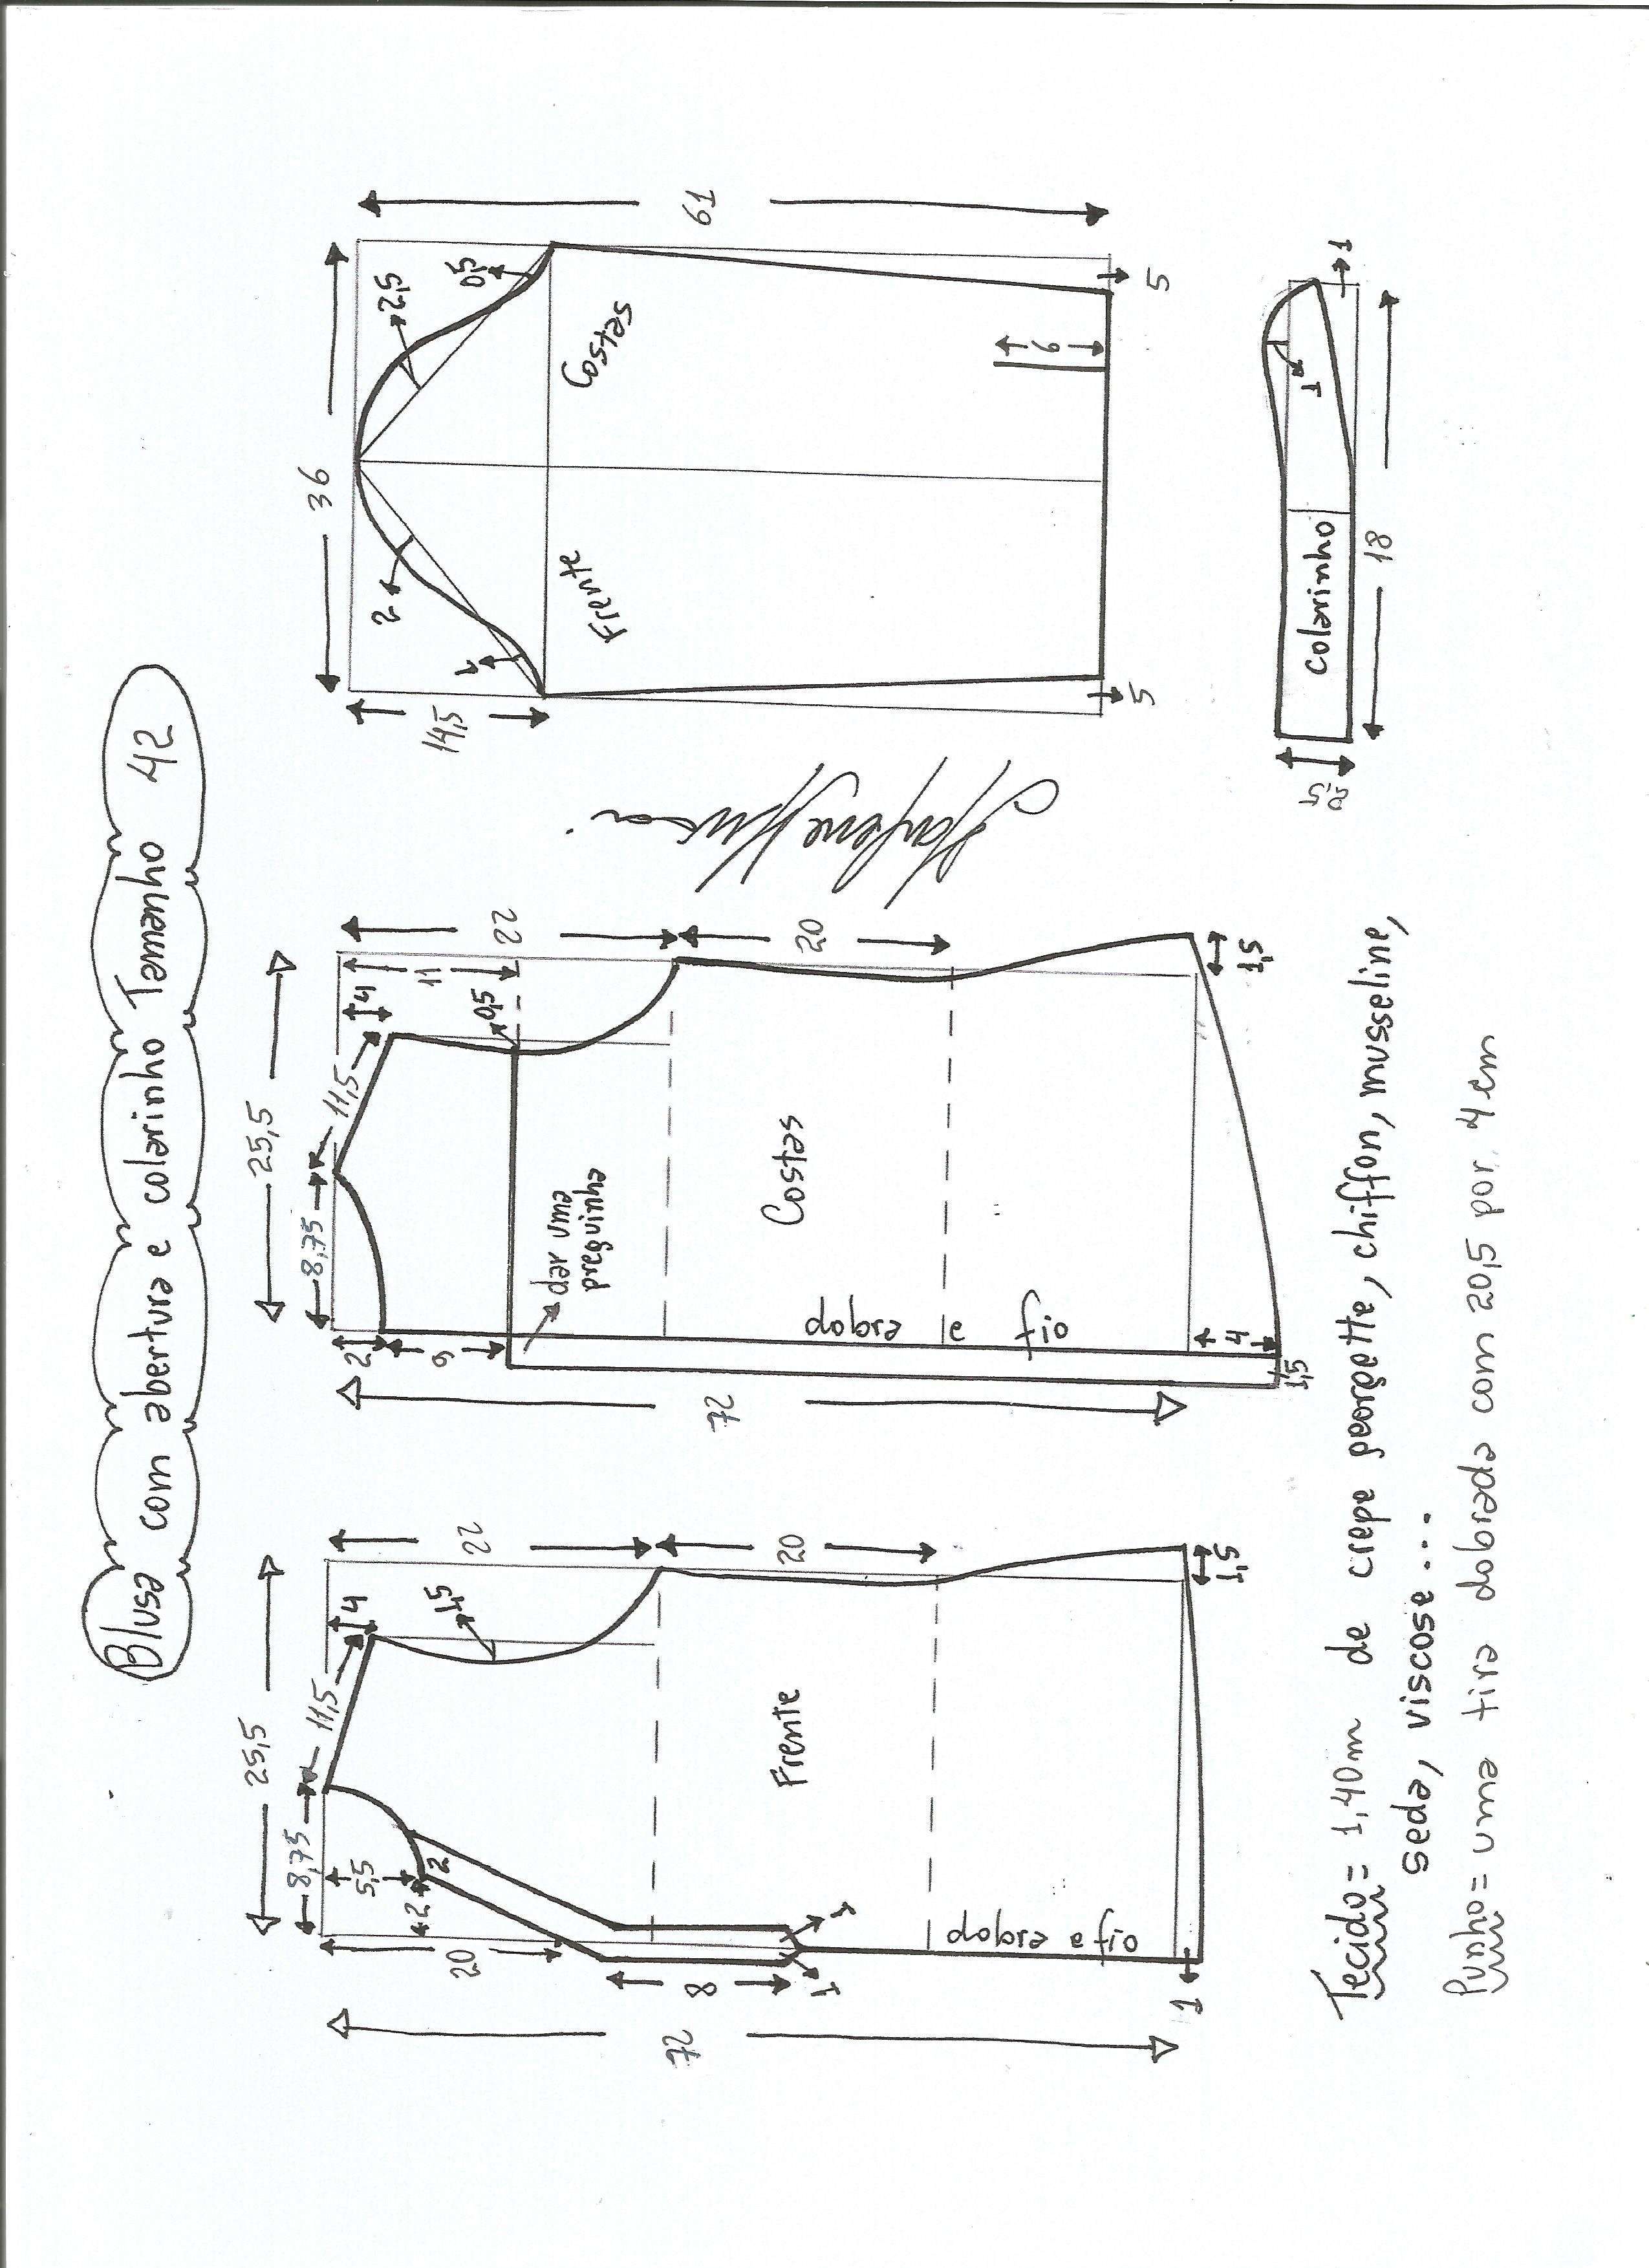 Blusa camisera manga larga con -abertura-42.jpg (2550×3507) Talla Grande